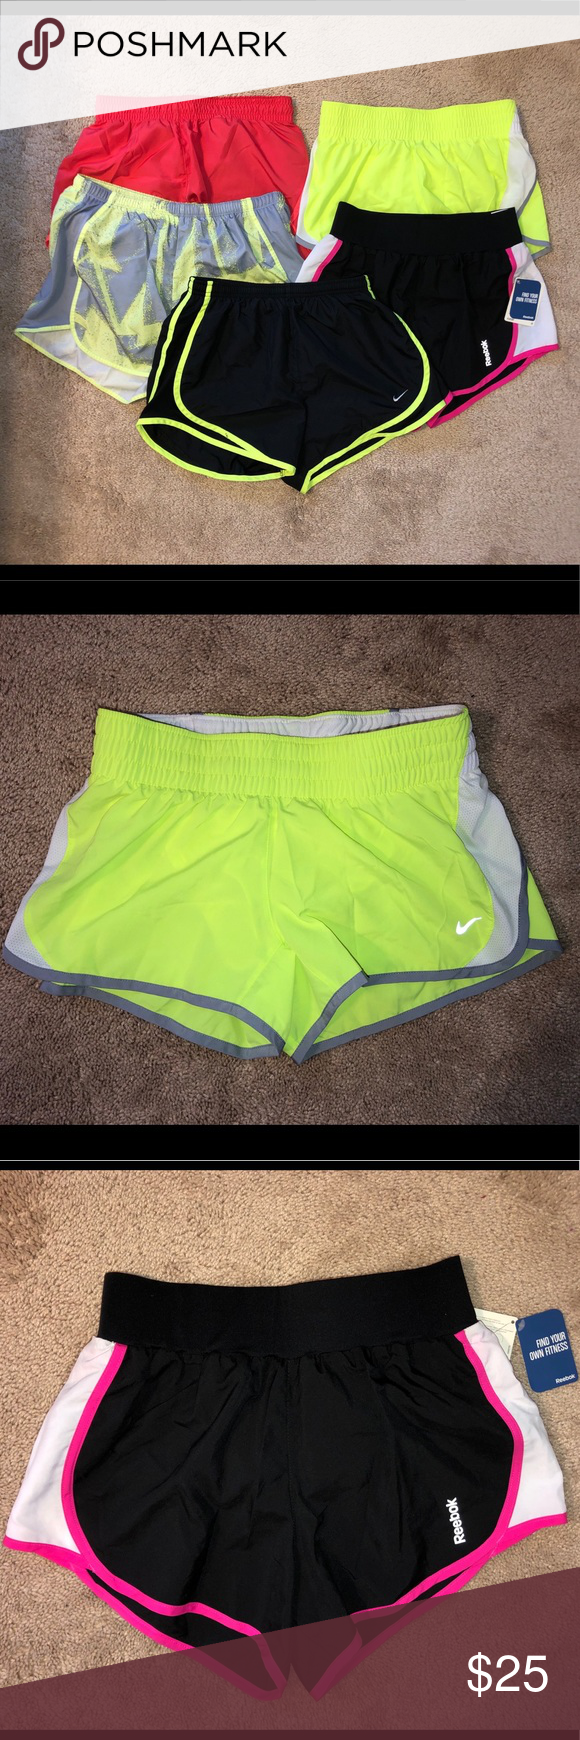 521f99bb Bundle Women's Running Shorts, Size S Worn 1-2 times Women's Running ...